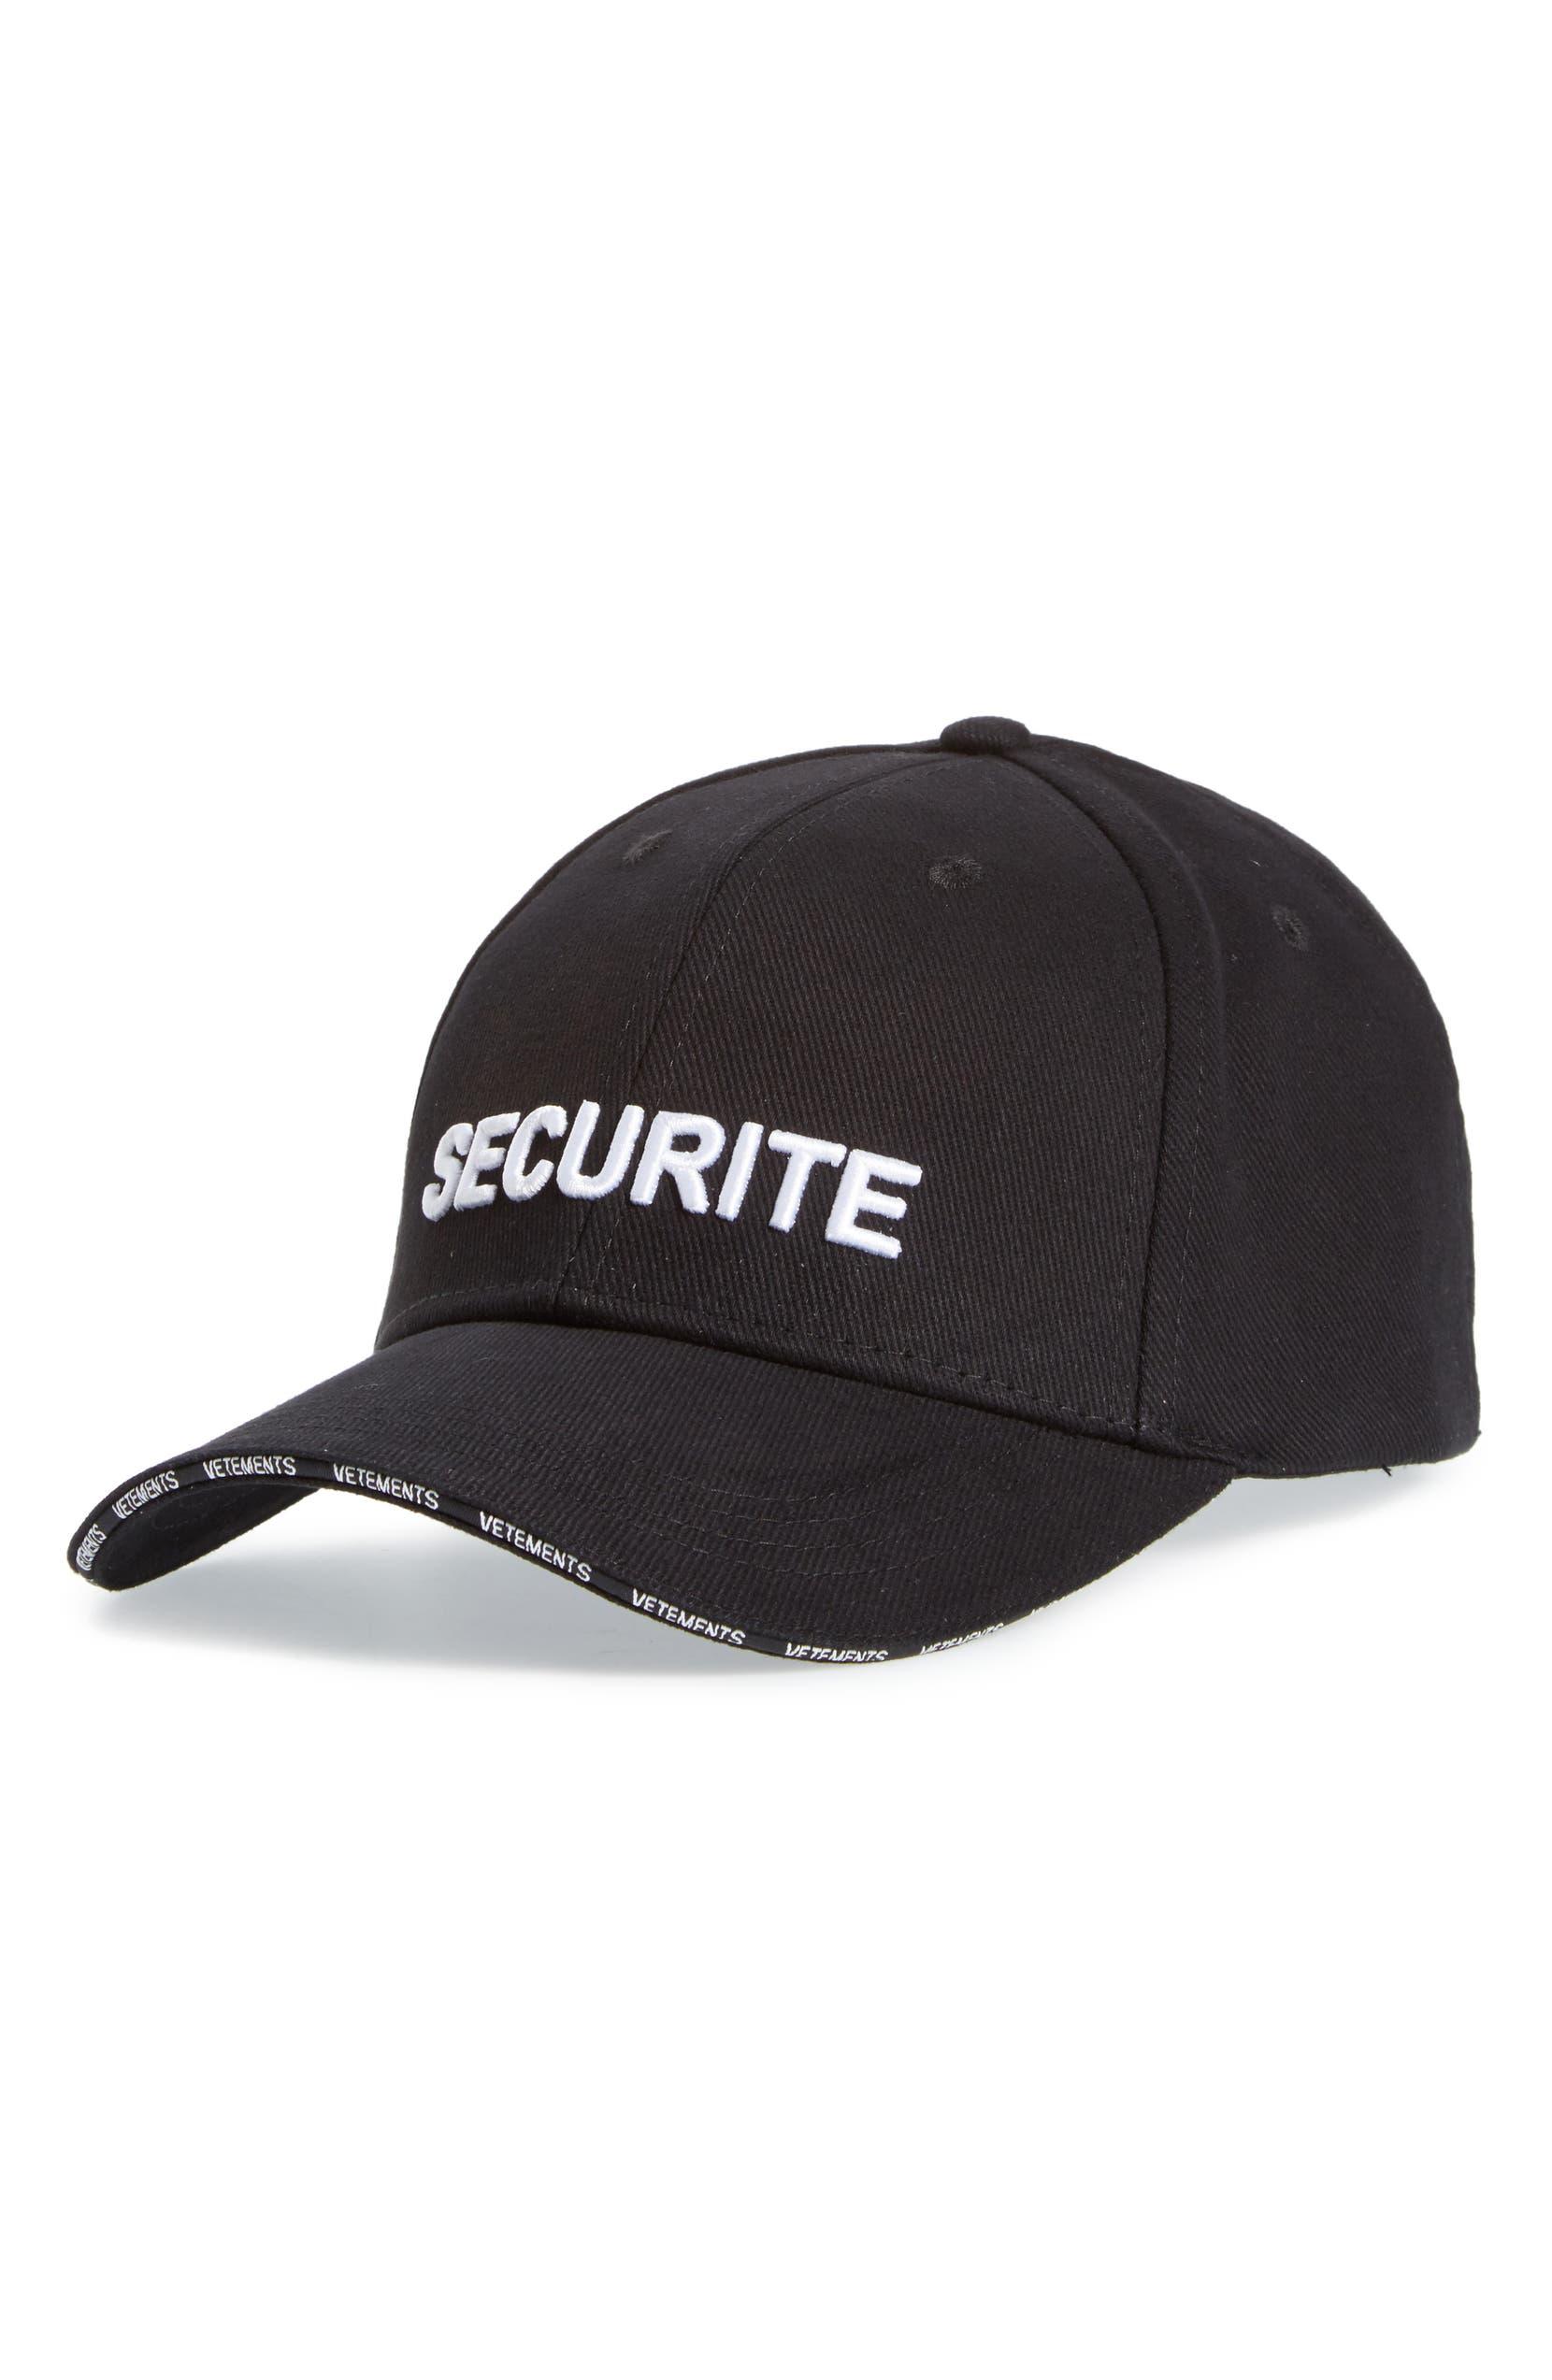 Vetements Securite Cap  91072b4f22b